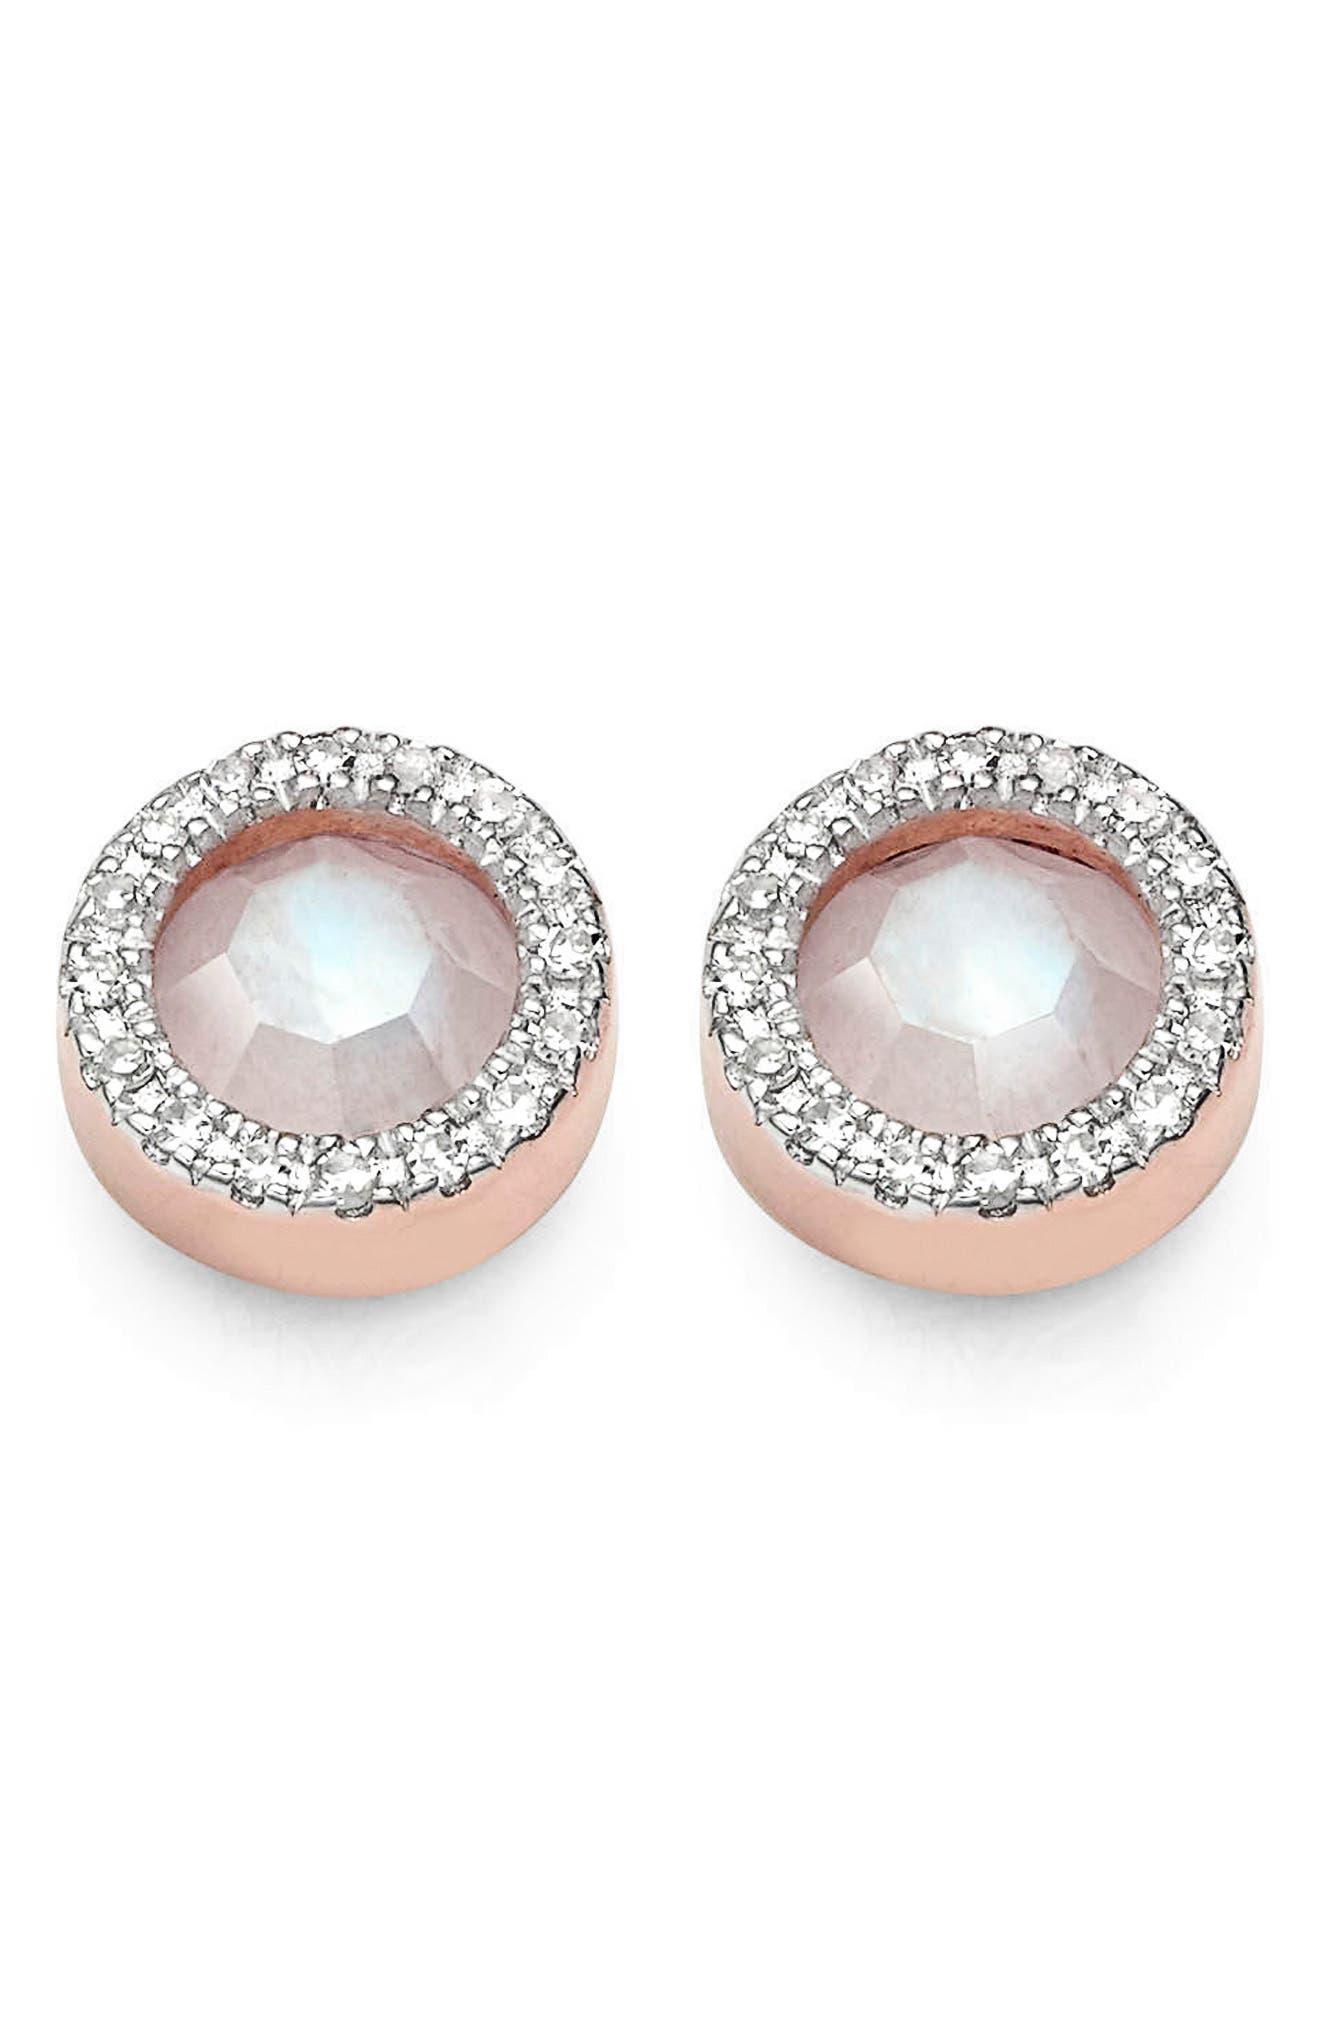 Monica Vinader Naida Diamond & Semiprecious Stone Stud Earrings